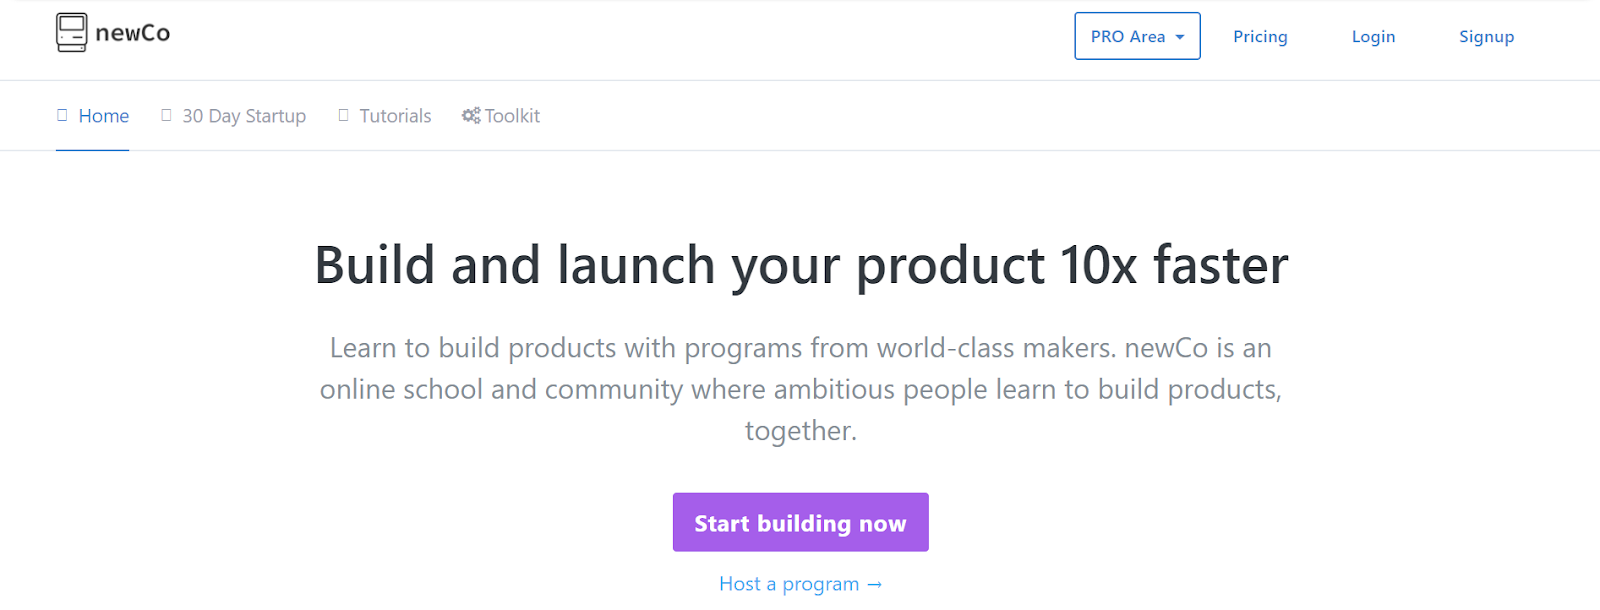 NewCo's homepage